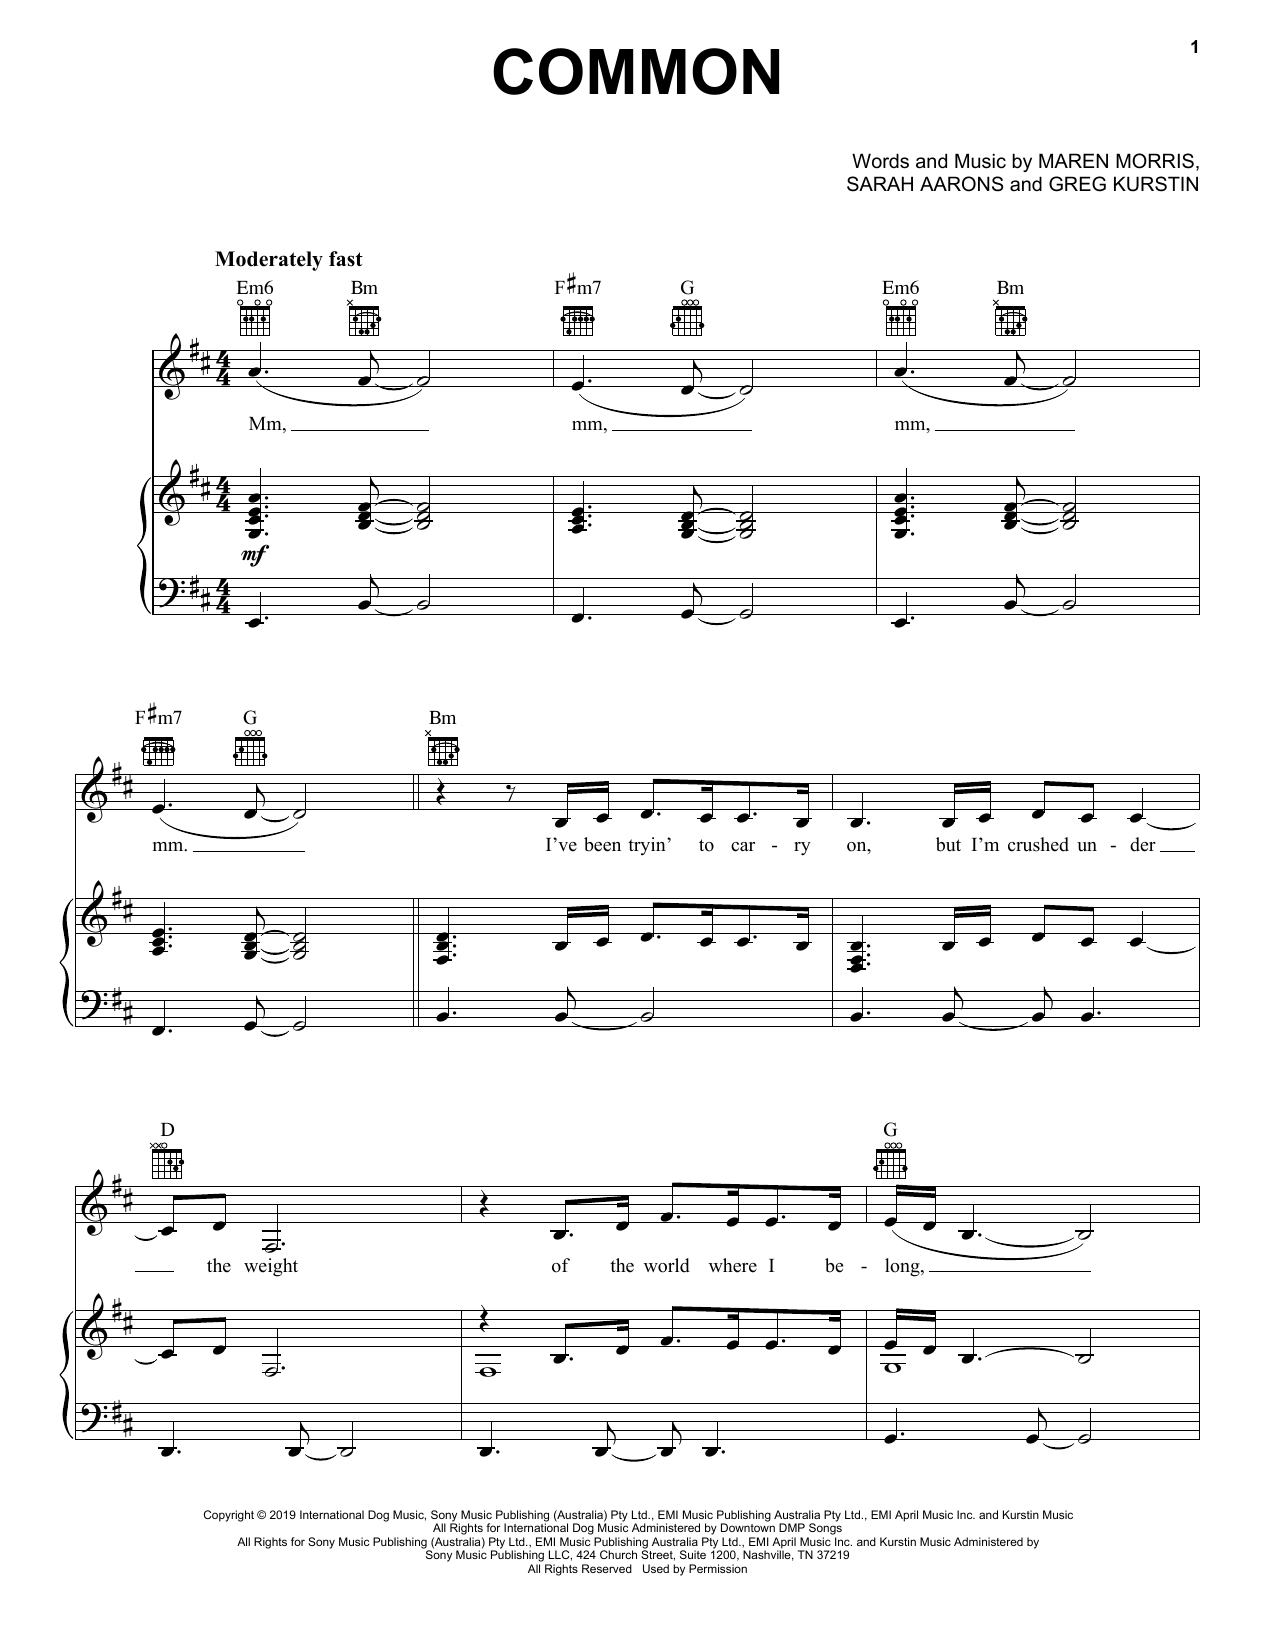 Maren Morris Common (feat. Brandi Carlile) sheet music notes and chords. Download Printable PDF.